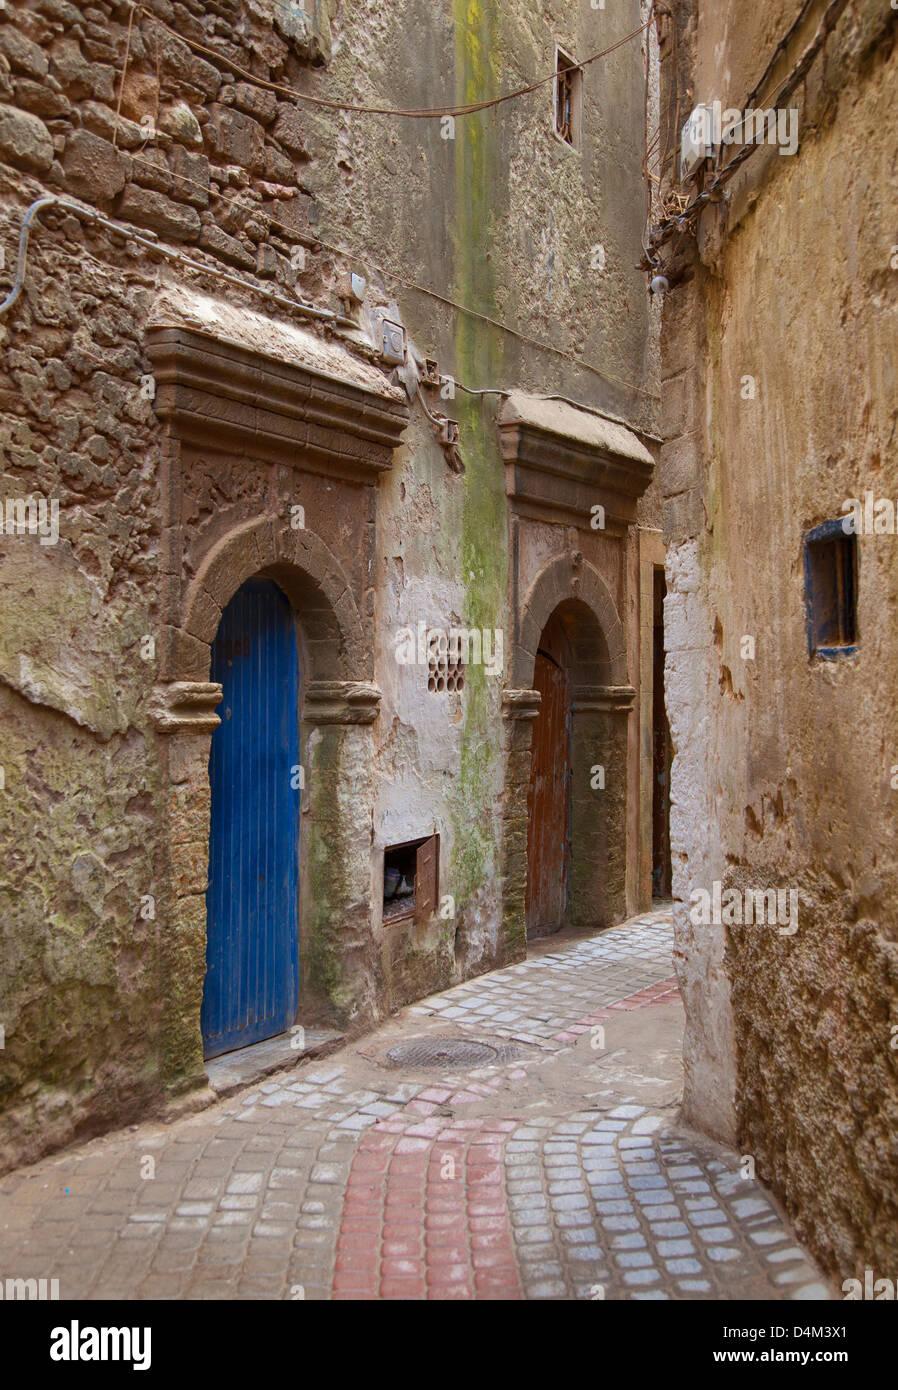 Arched doors in village alleyway - Stock Image